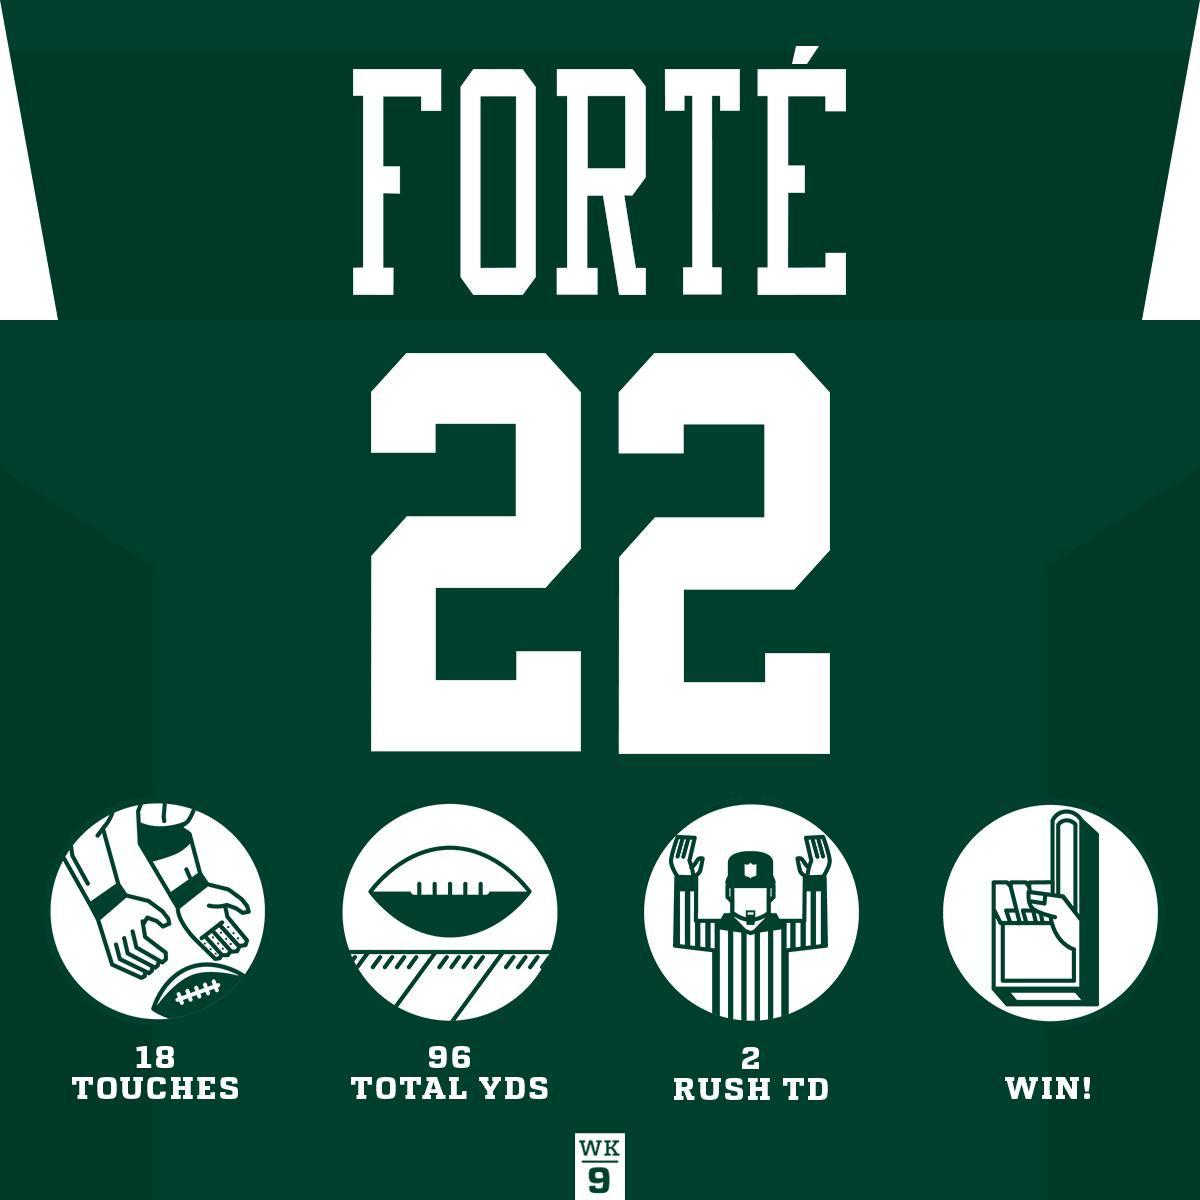 A two TD night for @MattForte22! #HaveADay#BUFvsNYJ #Jets